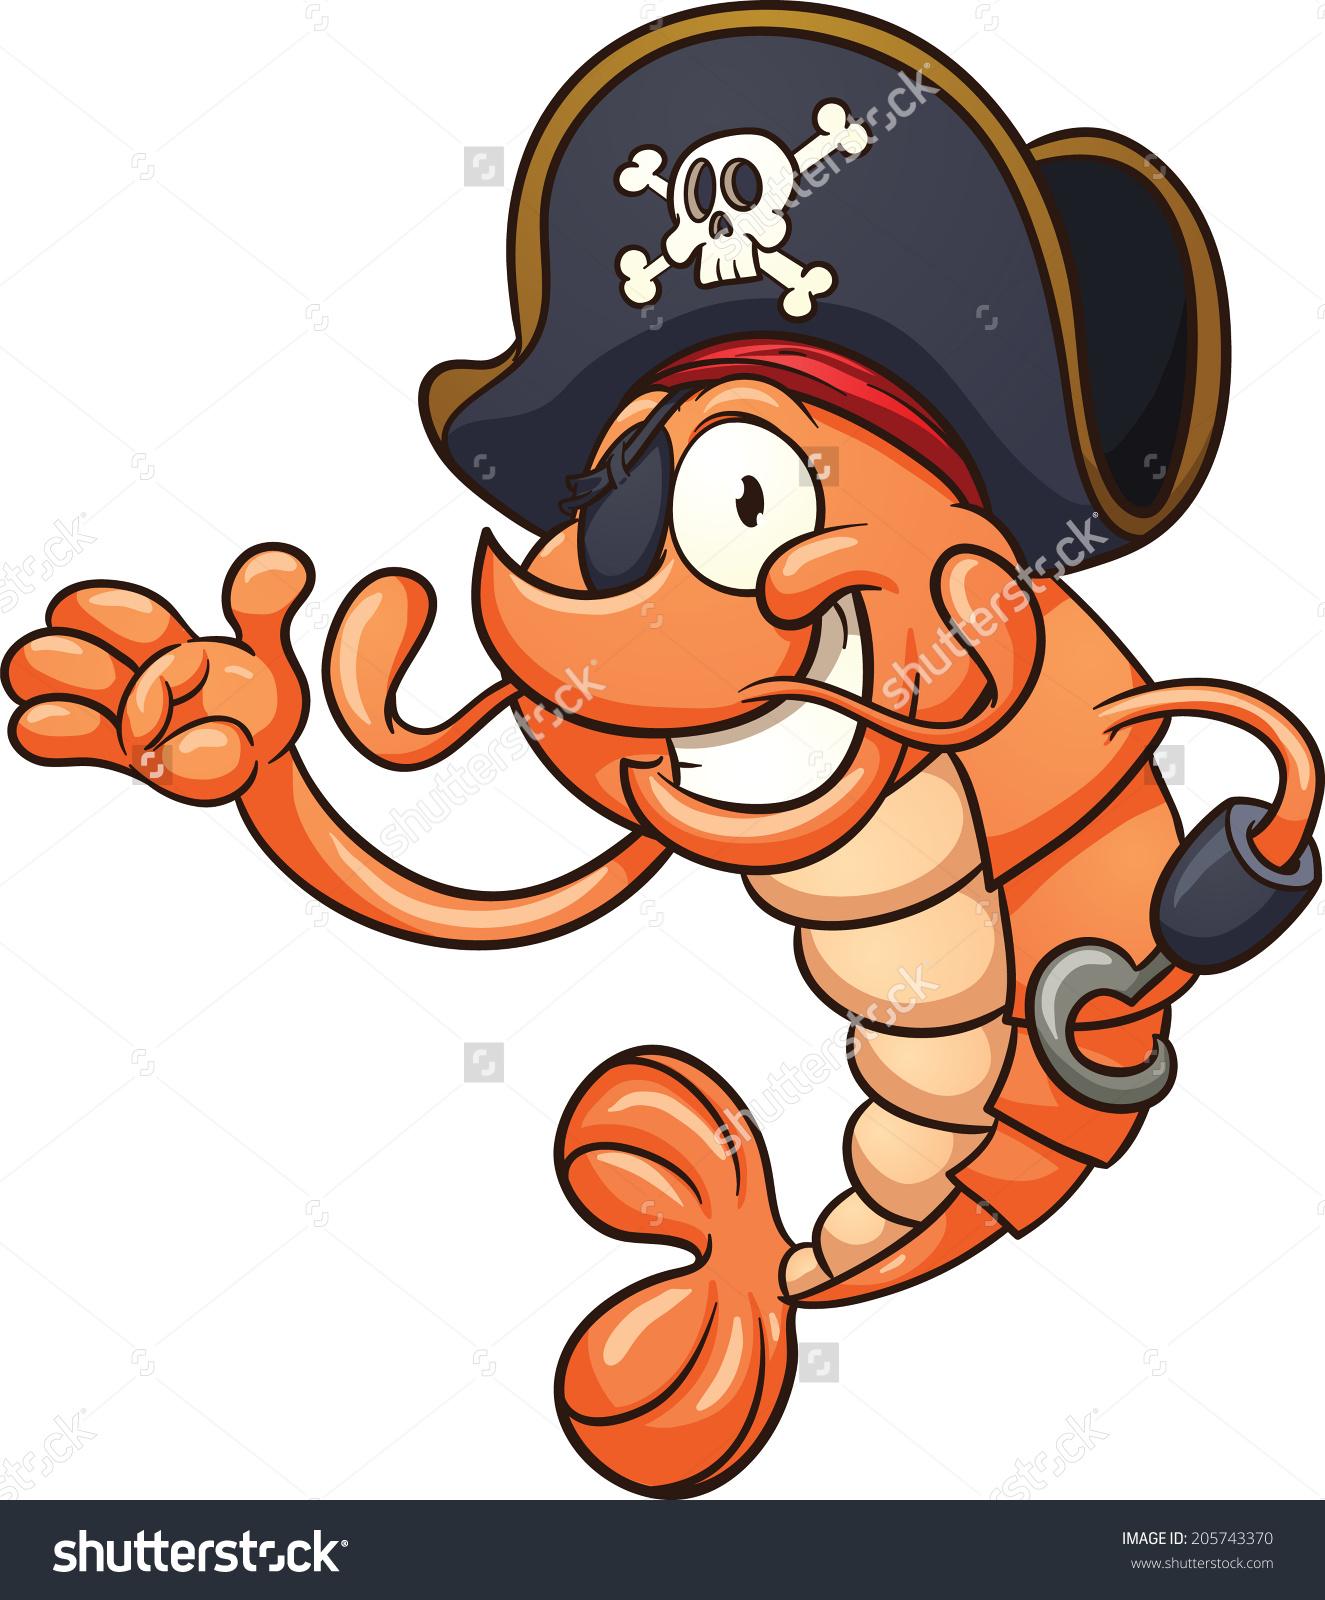 Pirate Shrimp Vector Clip Art Illustration Stock Vector 205743370.